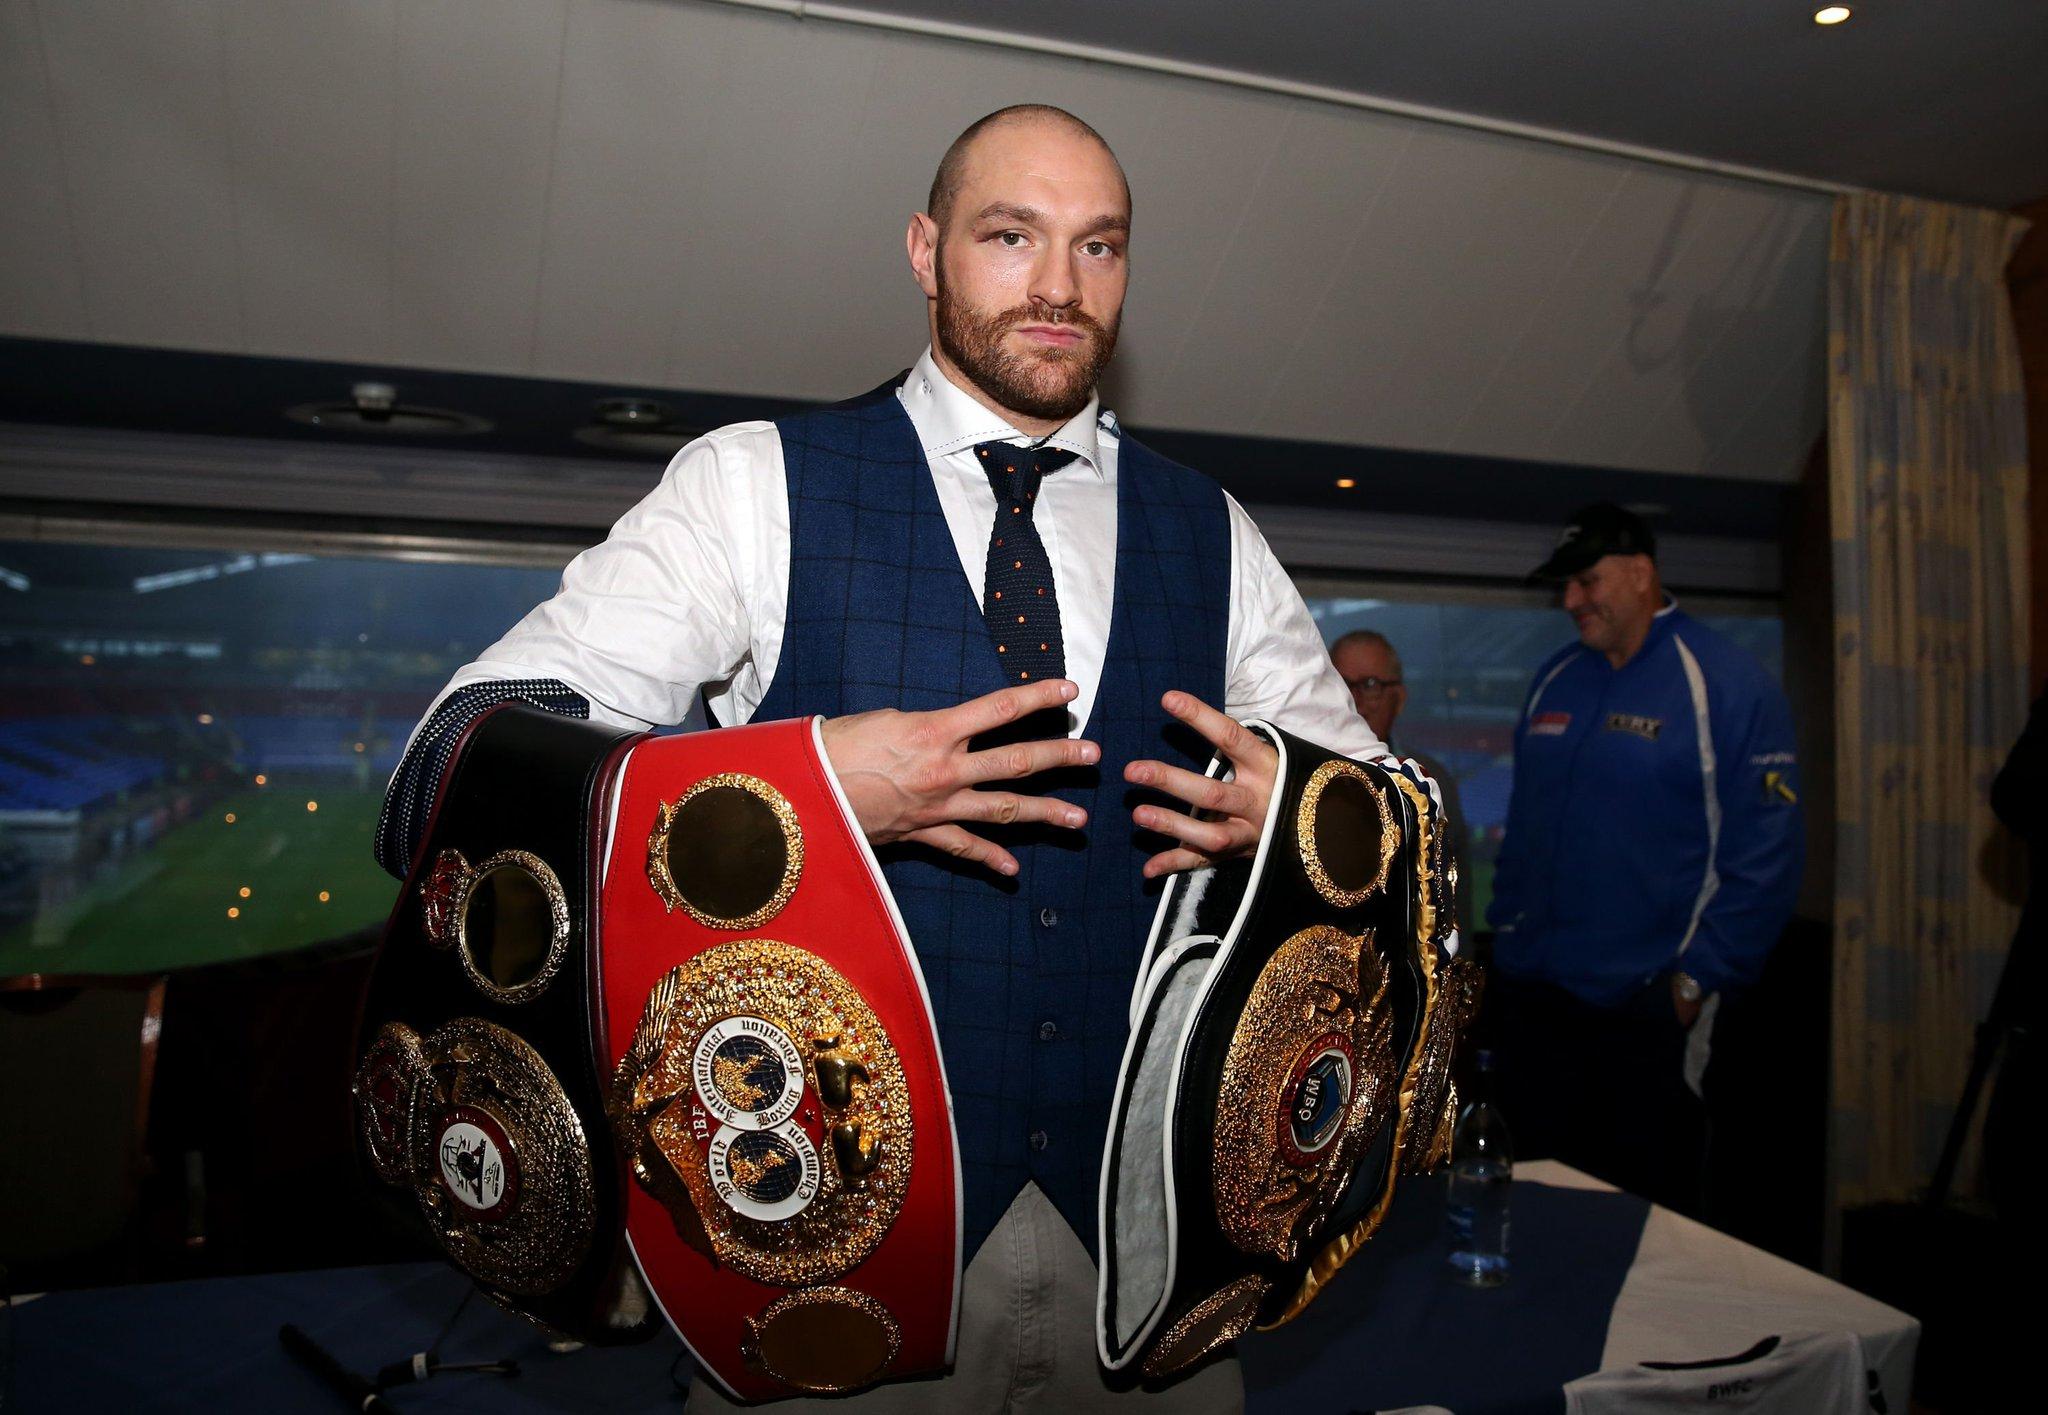 Heavyweight titles...  - WBA: - IBF: - WBO: - IBO: - Fights: 25 - Wins: 25  Happy birthday Tyson Fury!